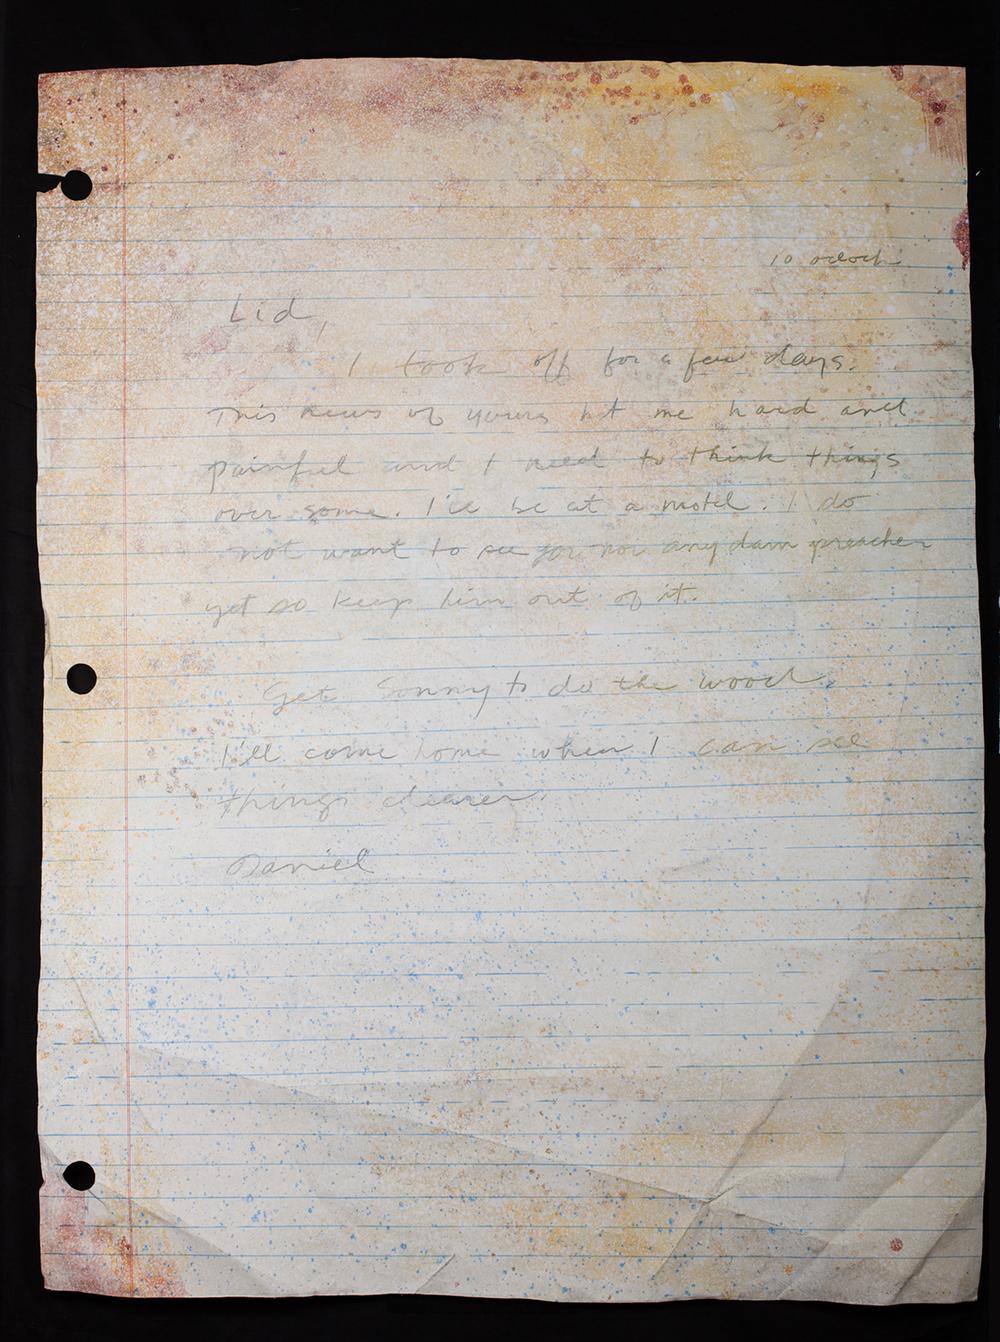 No. 19: Daniel's Note To Liddy.